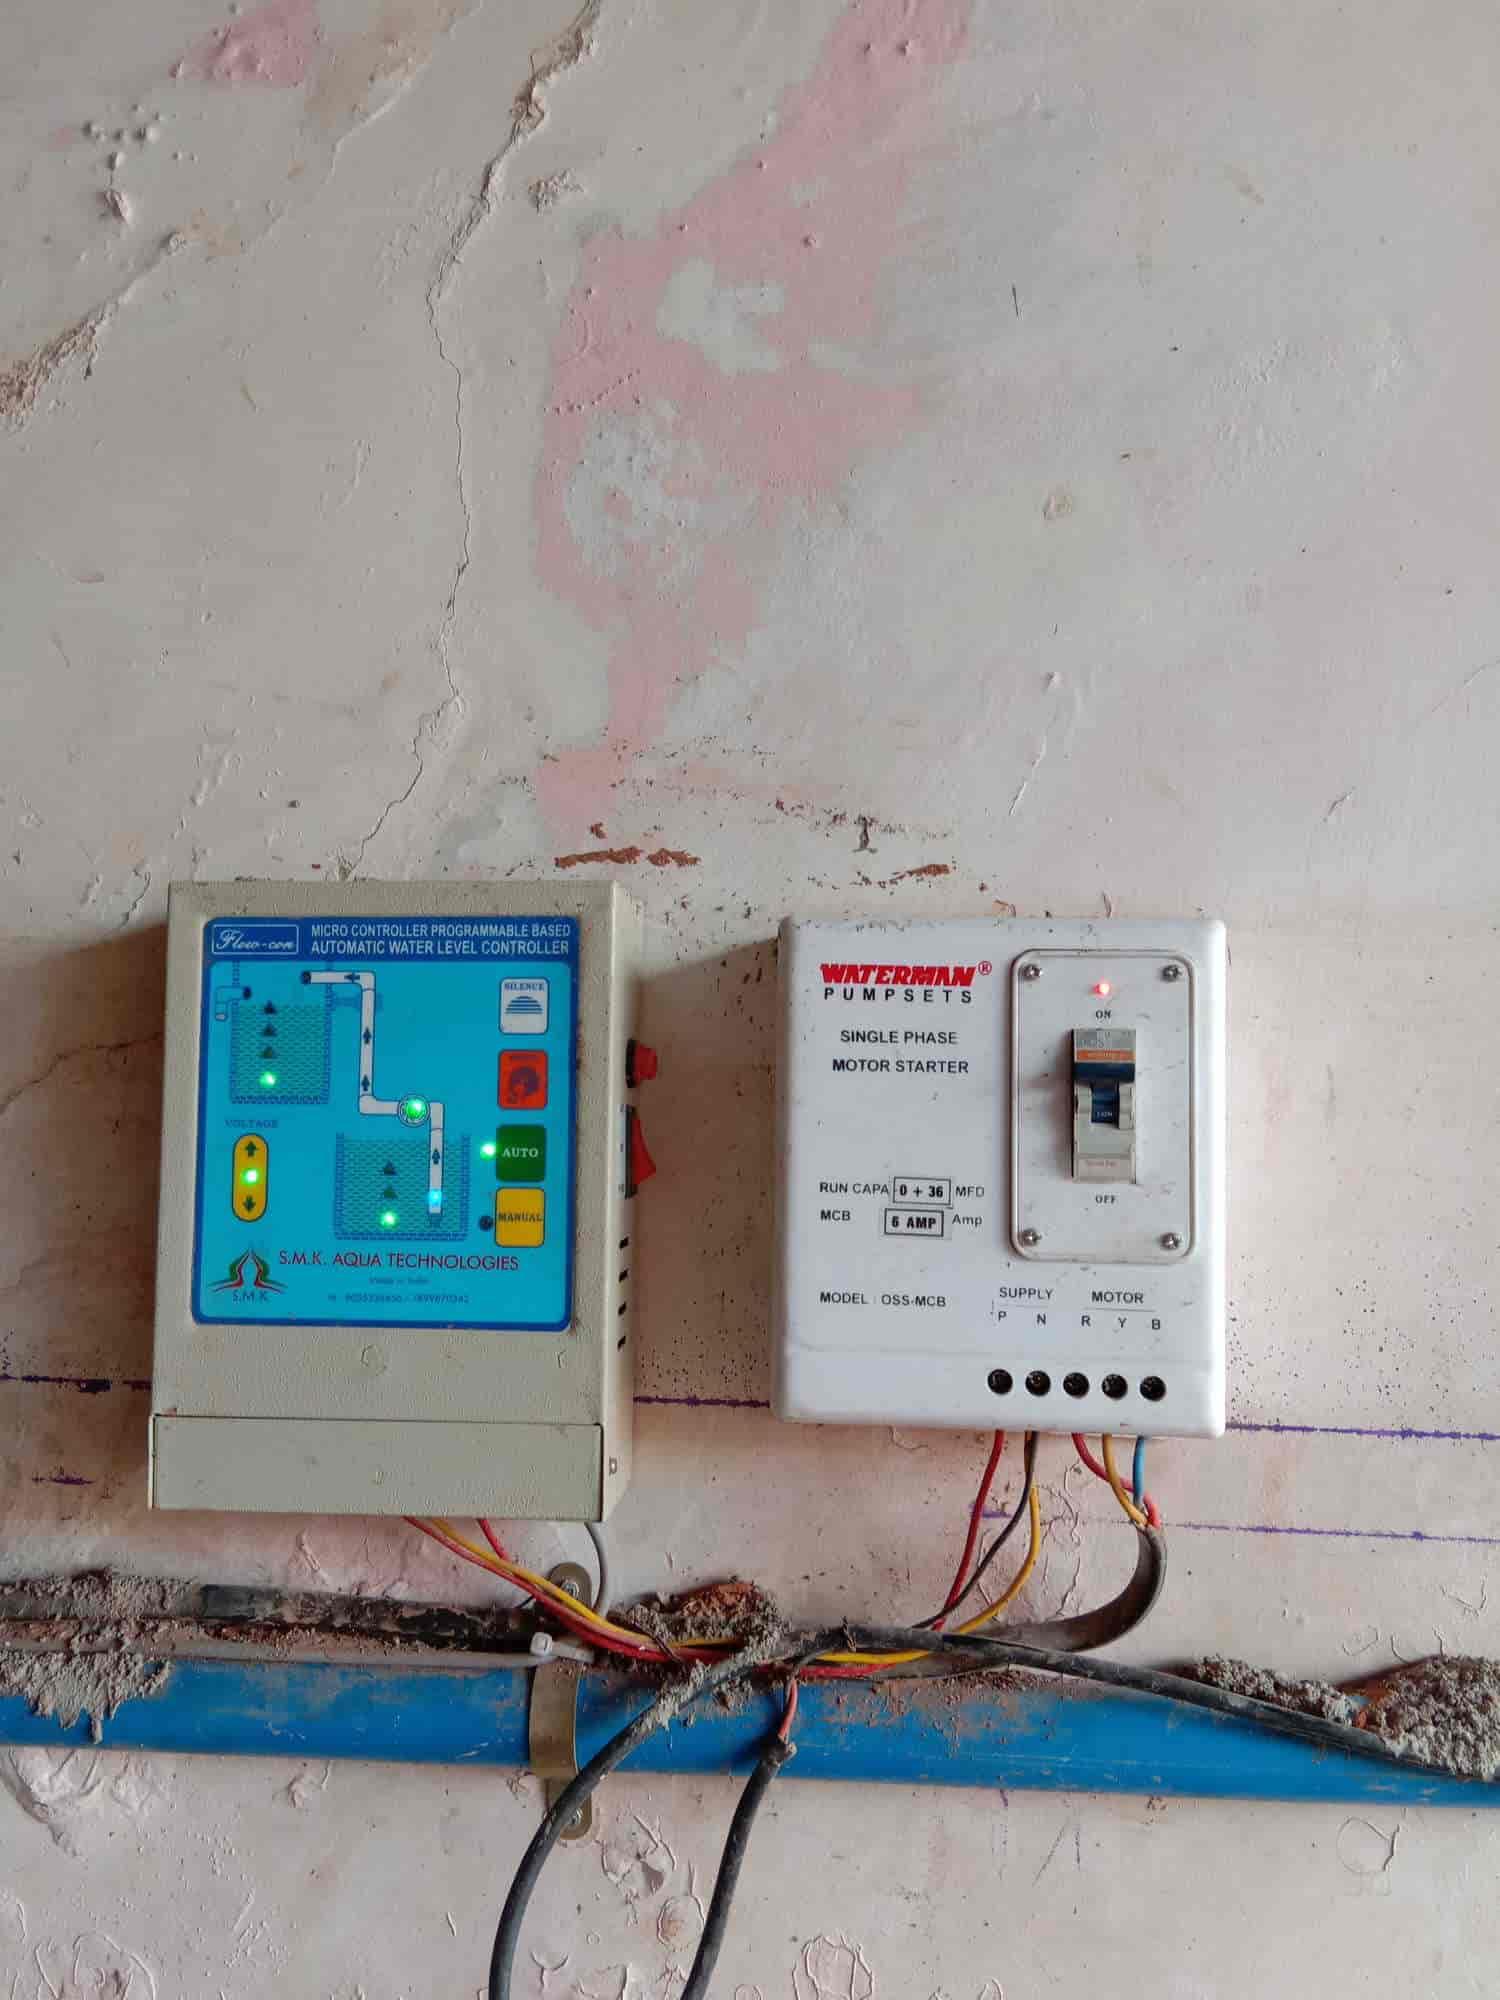 Smk Aqua Technologies Photos, 100 Bed Hospital Road, Hospet